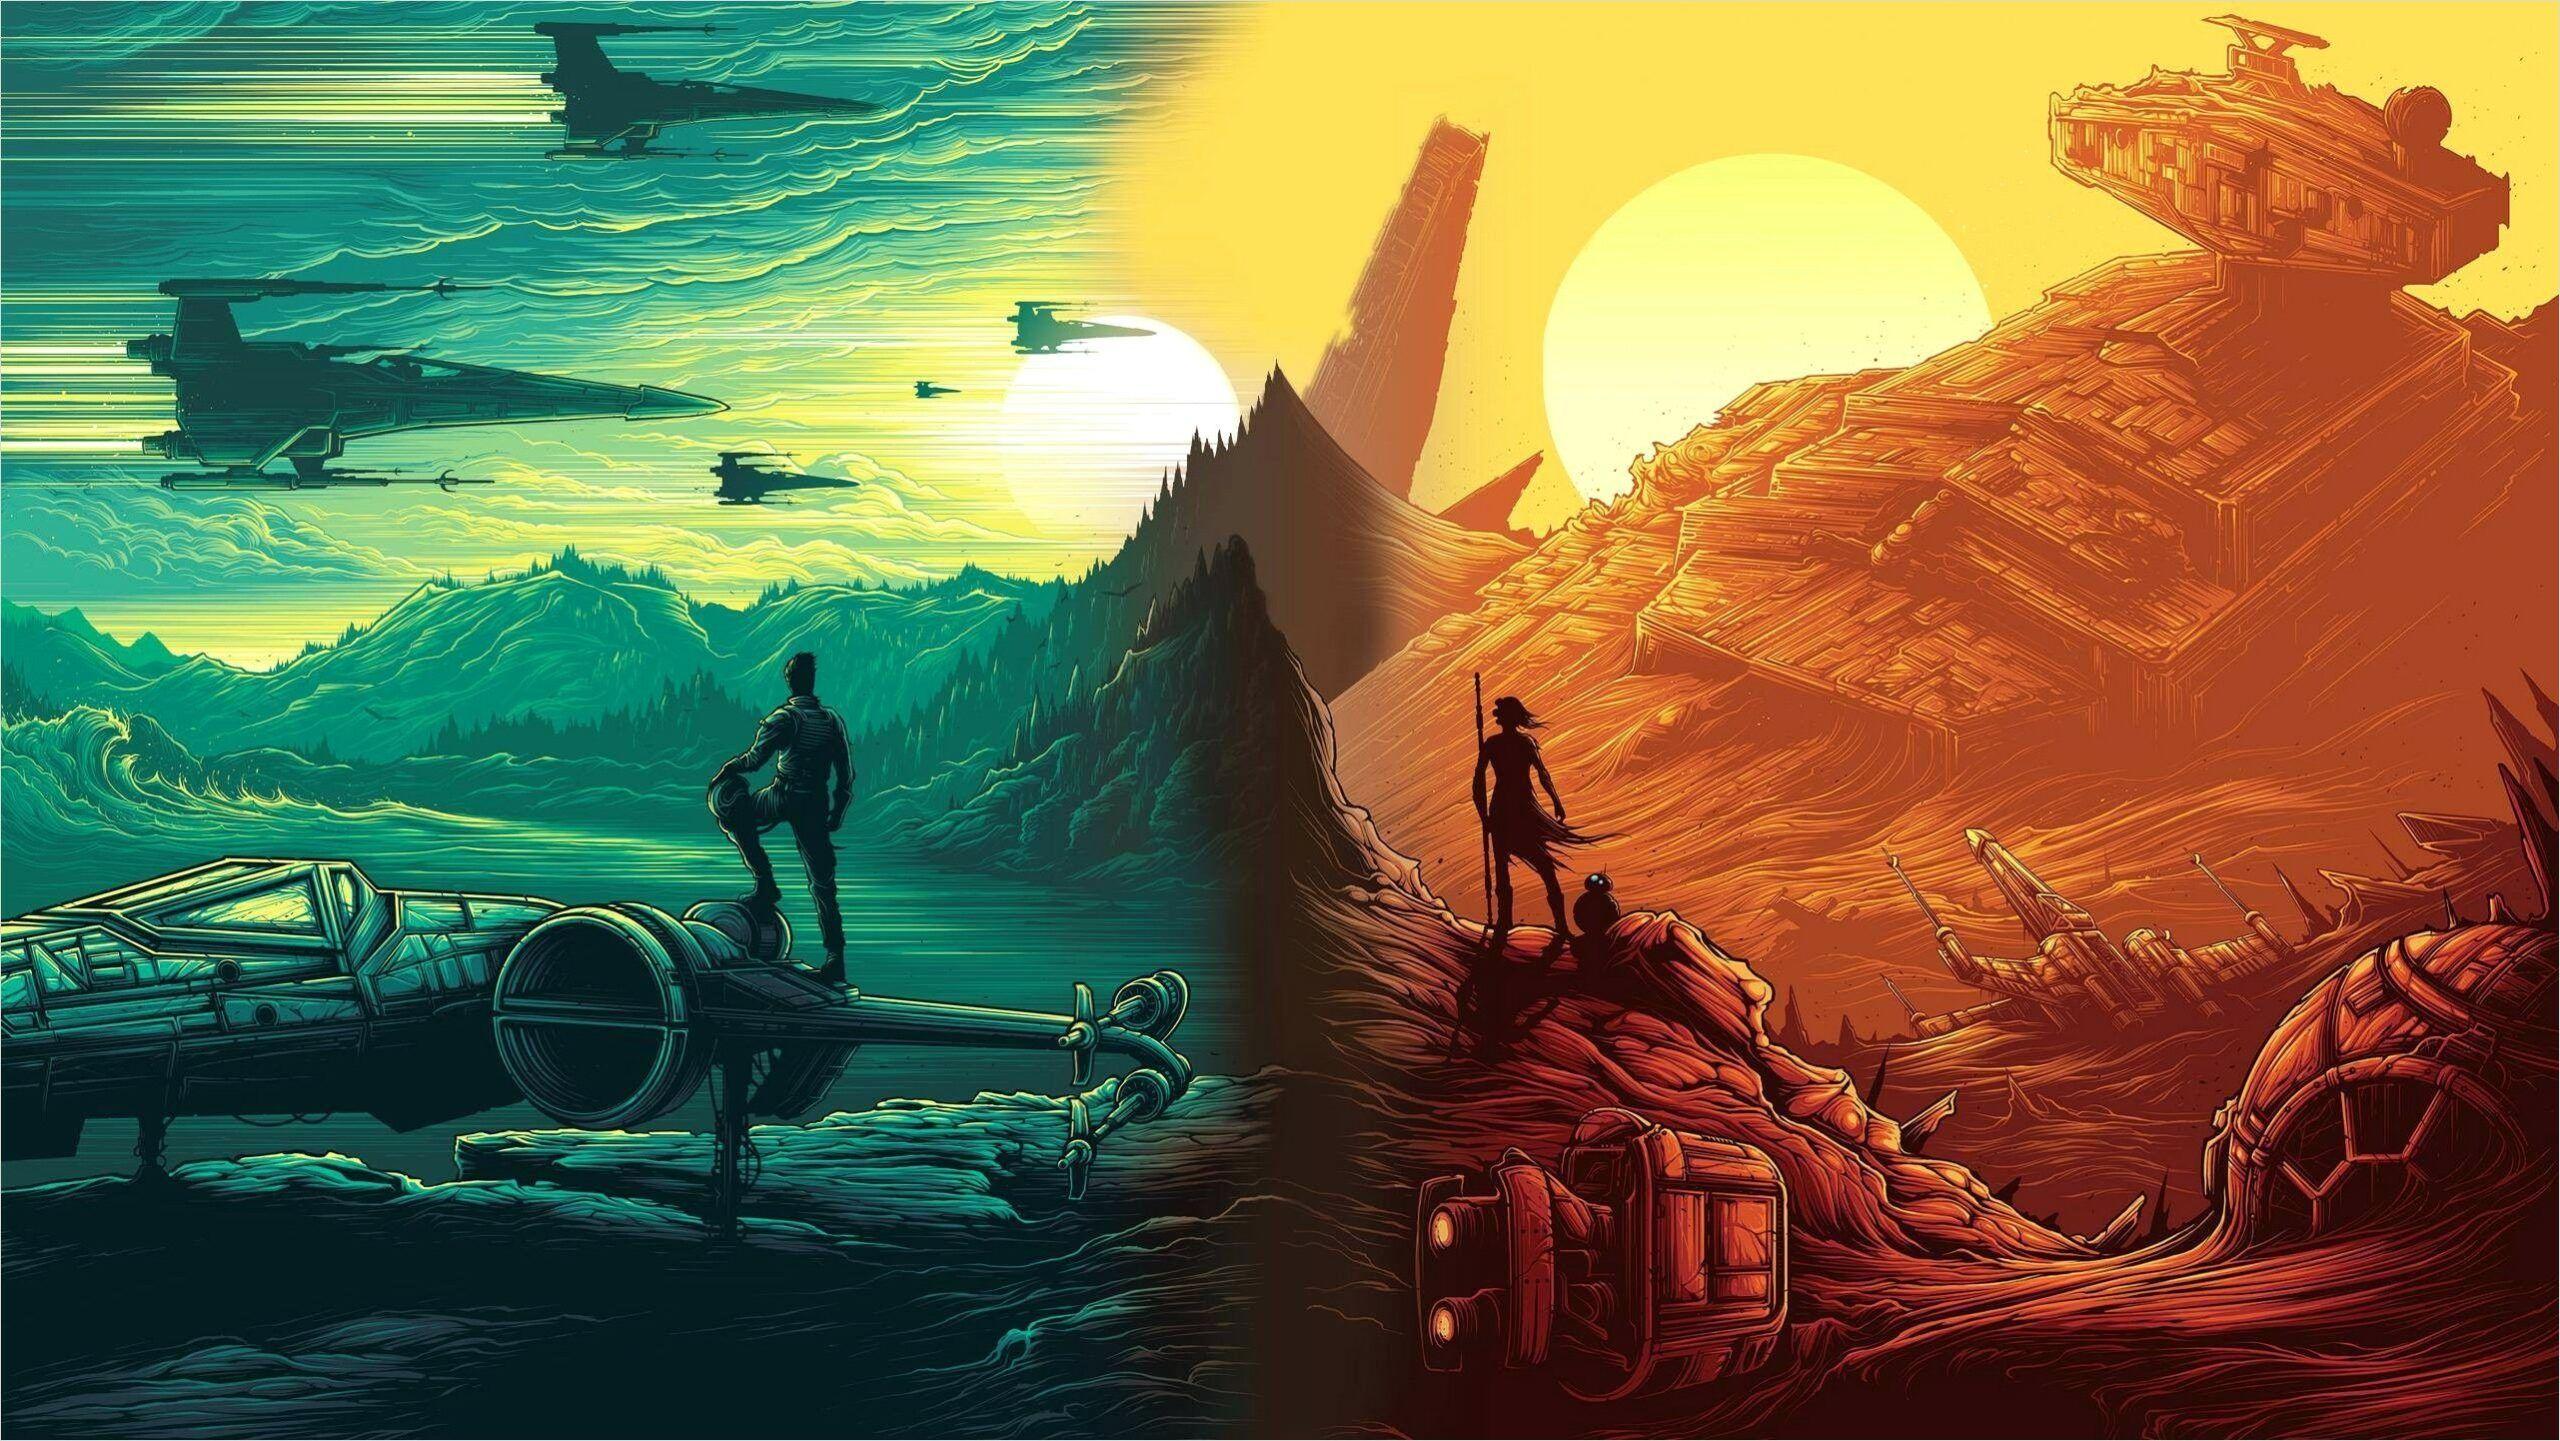 4k Star Wars Wallpaper Pc In 2020 Star Wars Wallpaper 3840x2160 Wallpaper Star Wars Pc